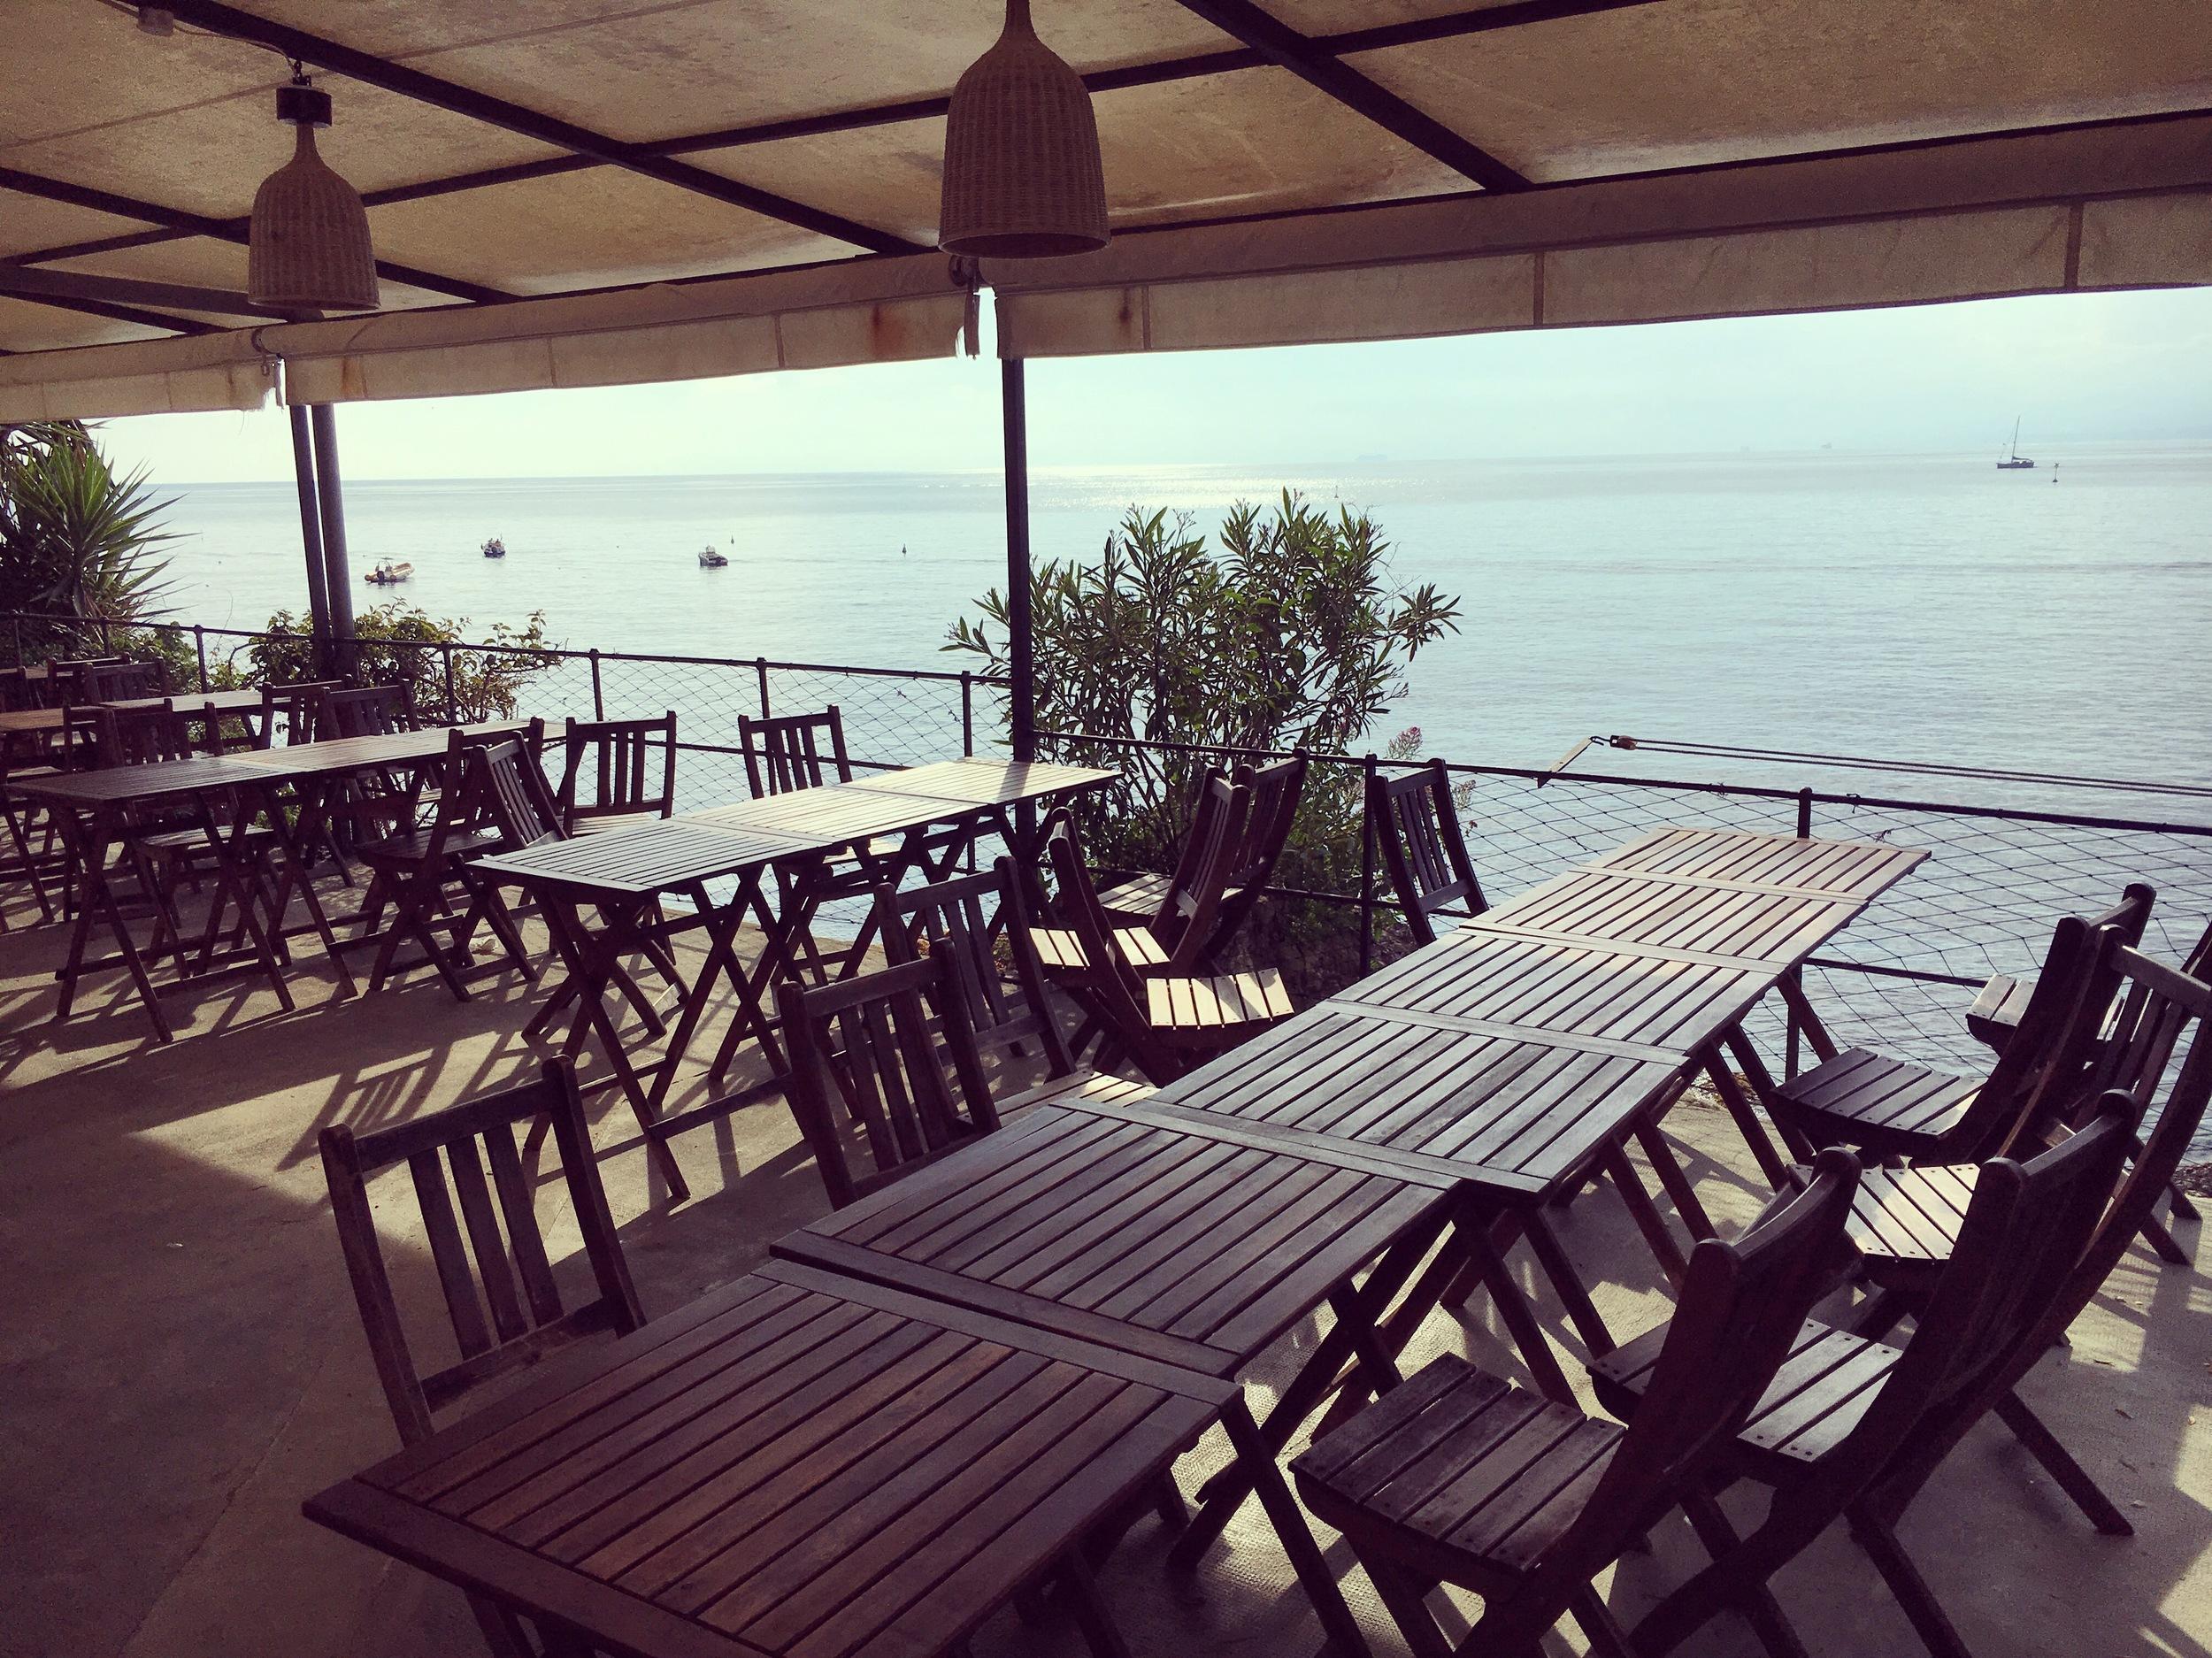 Reasons to visit punta chiappa camogli